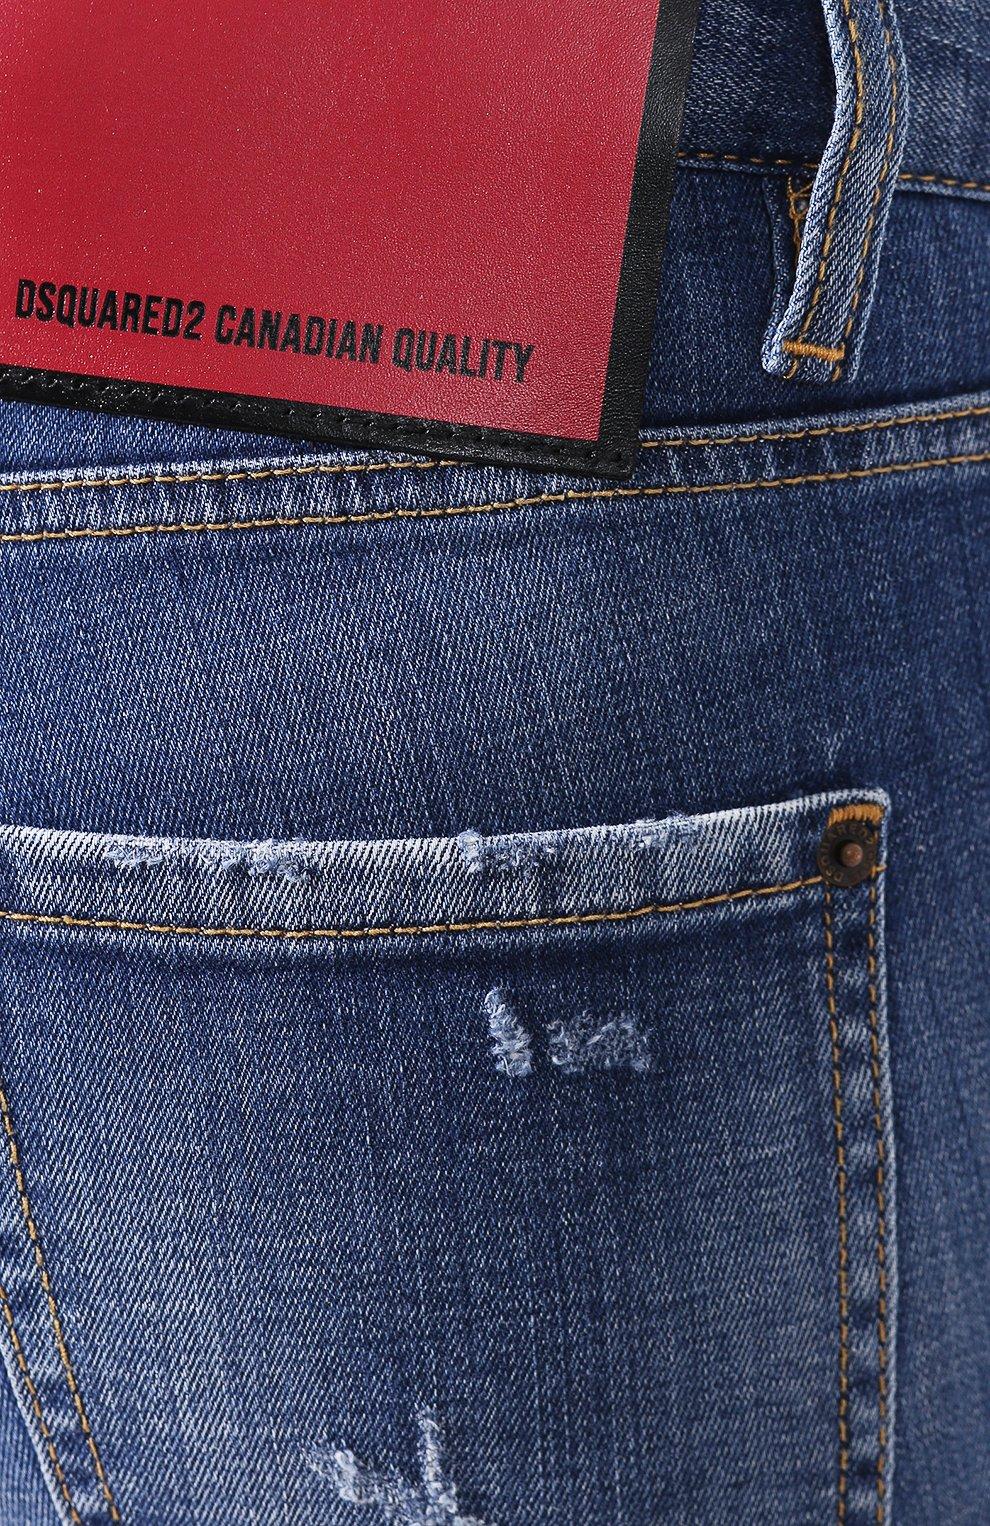 Женские джинсы DSQUARED2 синего цвета, арт. S75LB0322/S30342   Фото 5